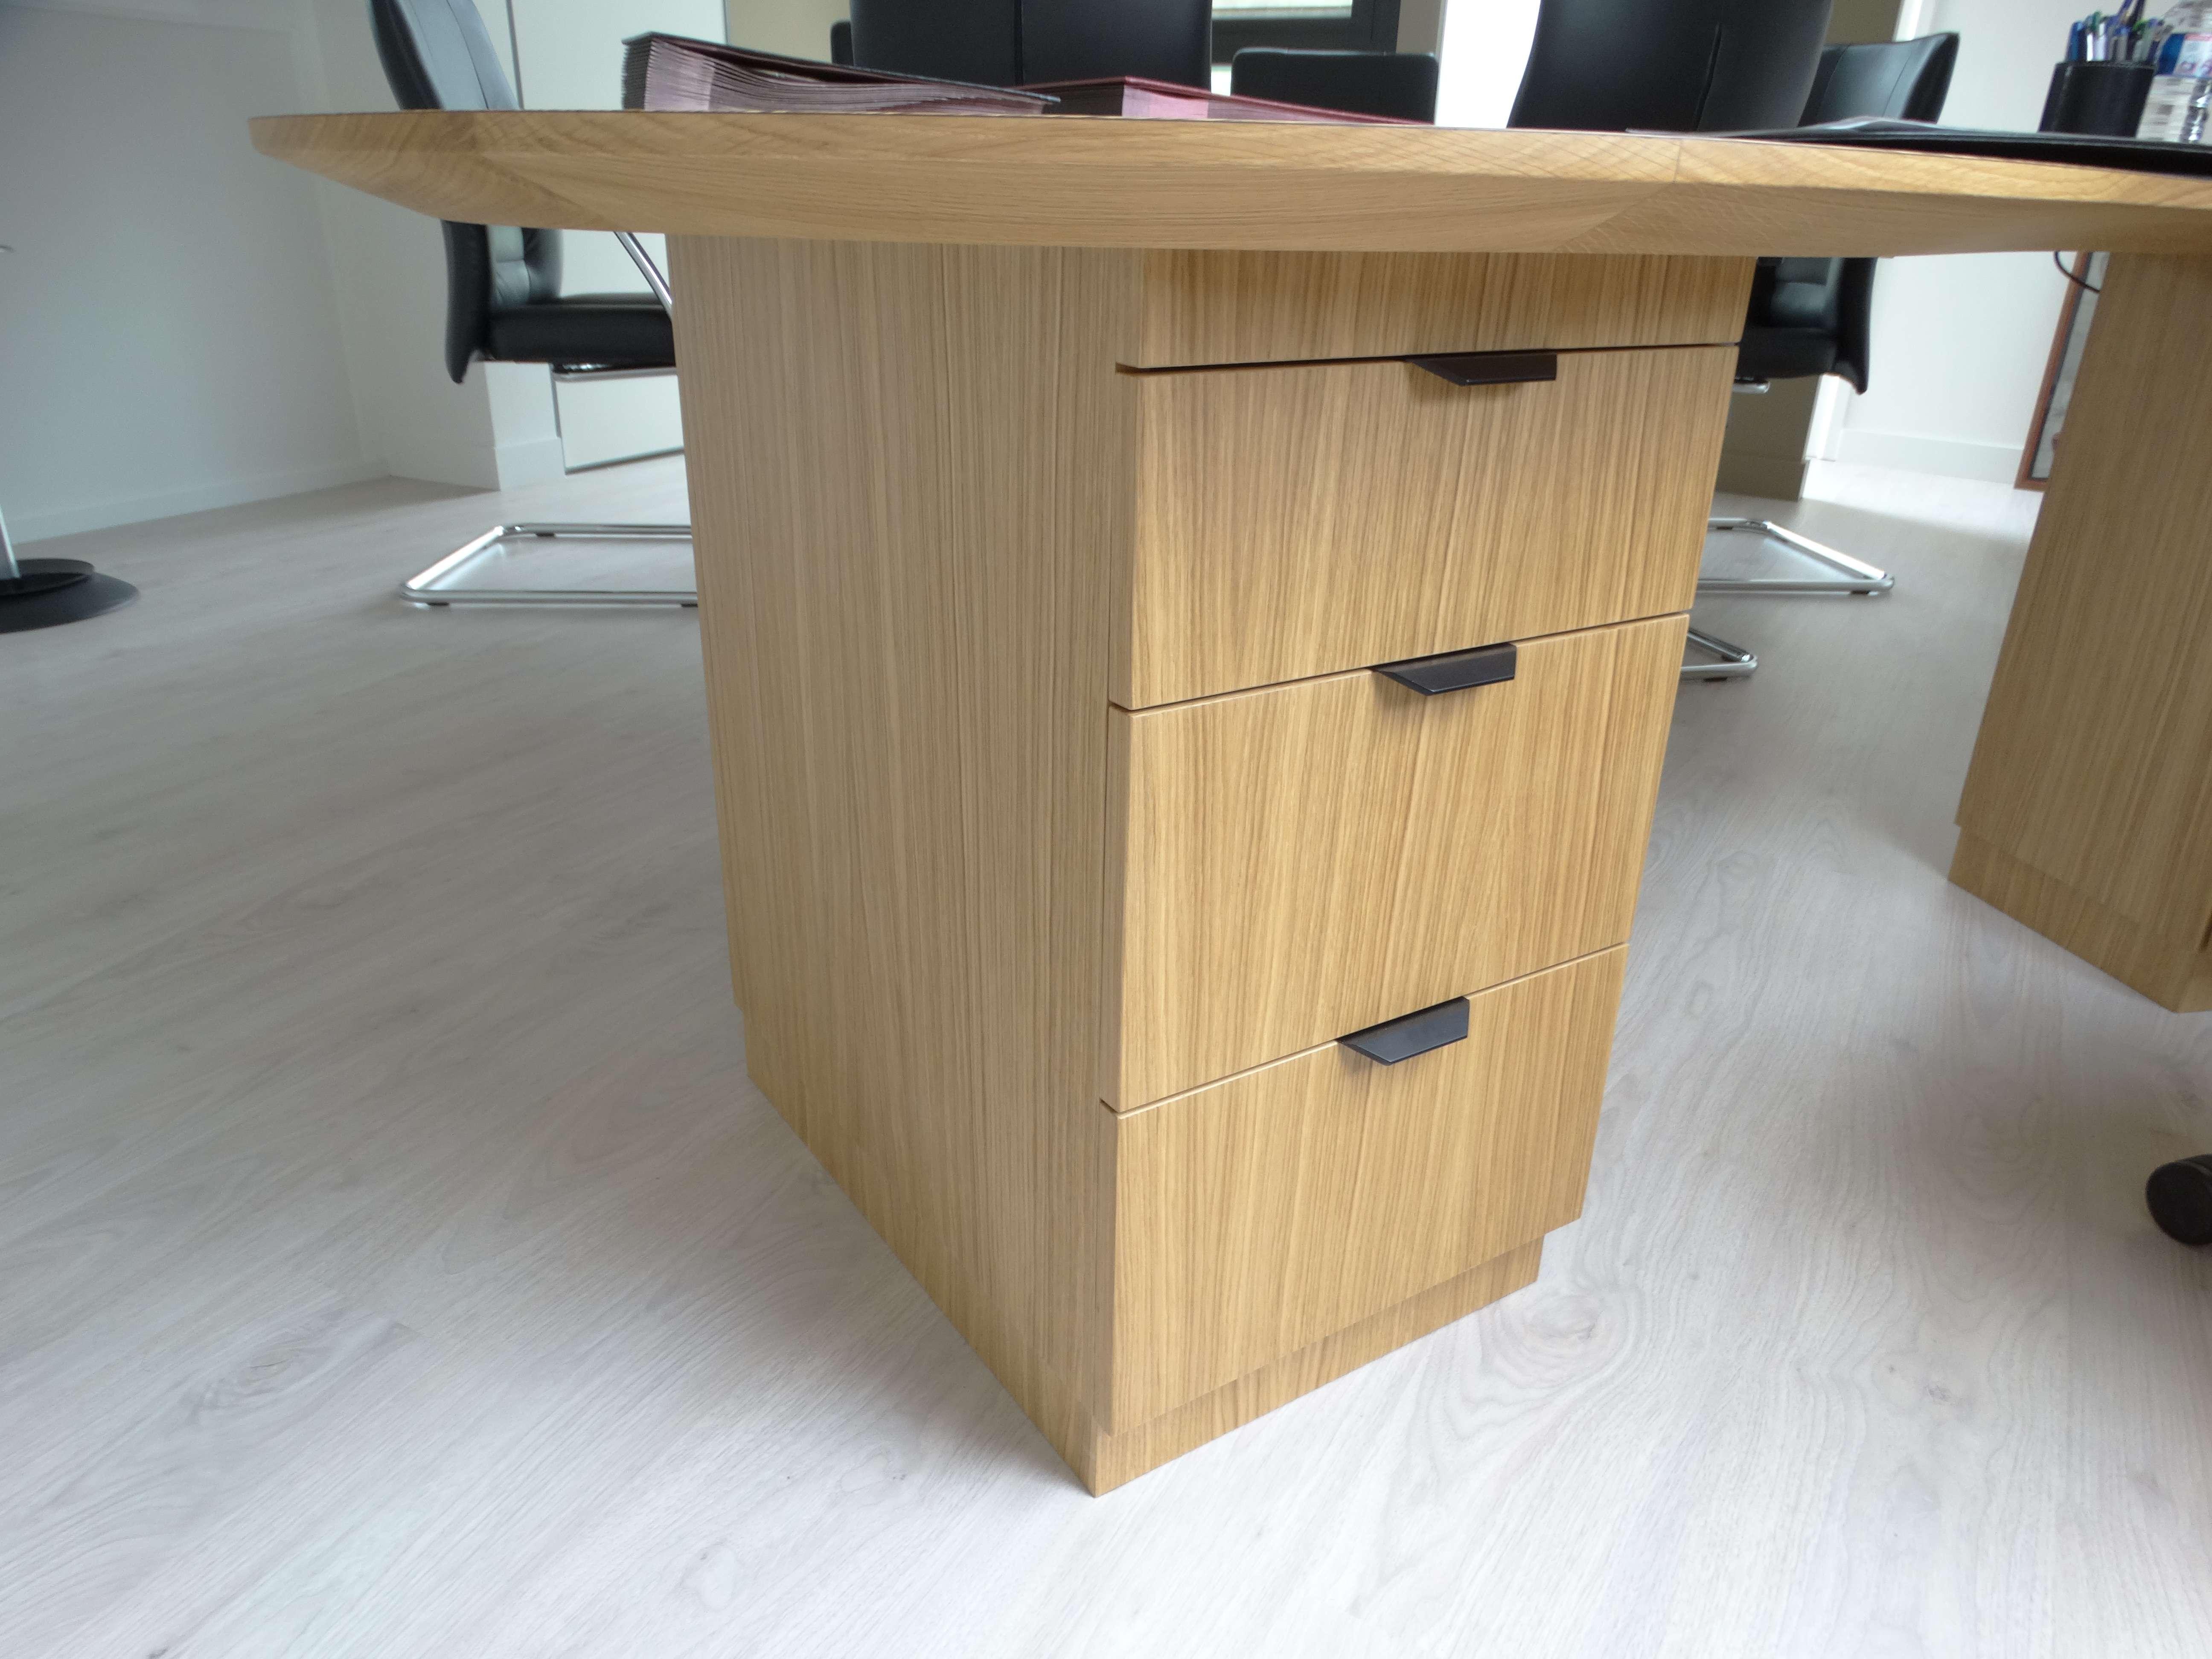 Caisson de tiroirs sur mesure bureau mairie - Bureau original mairie en bois zebrano et chêne